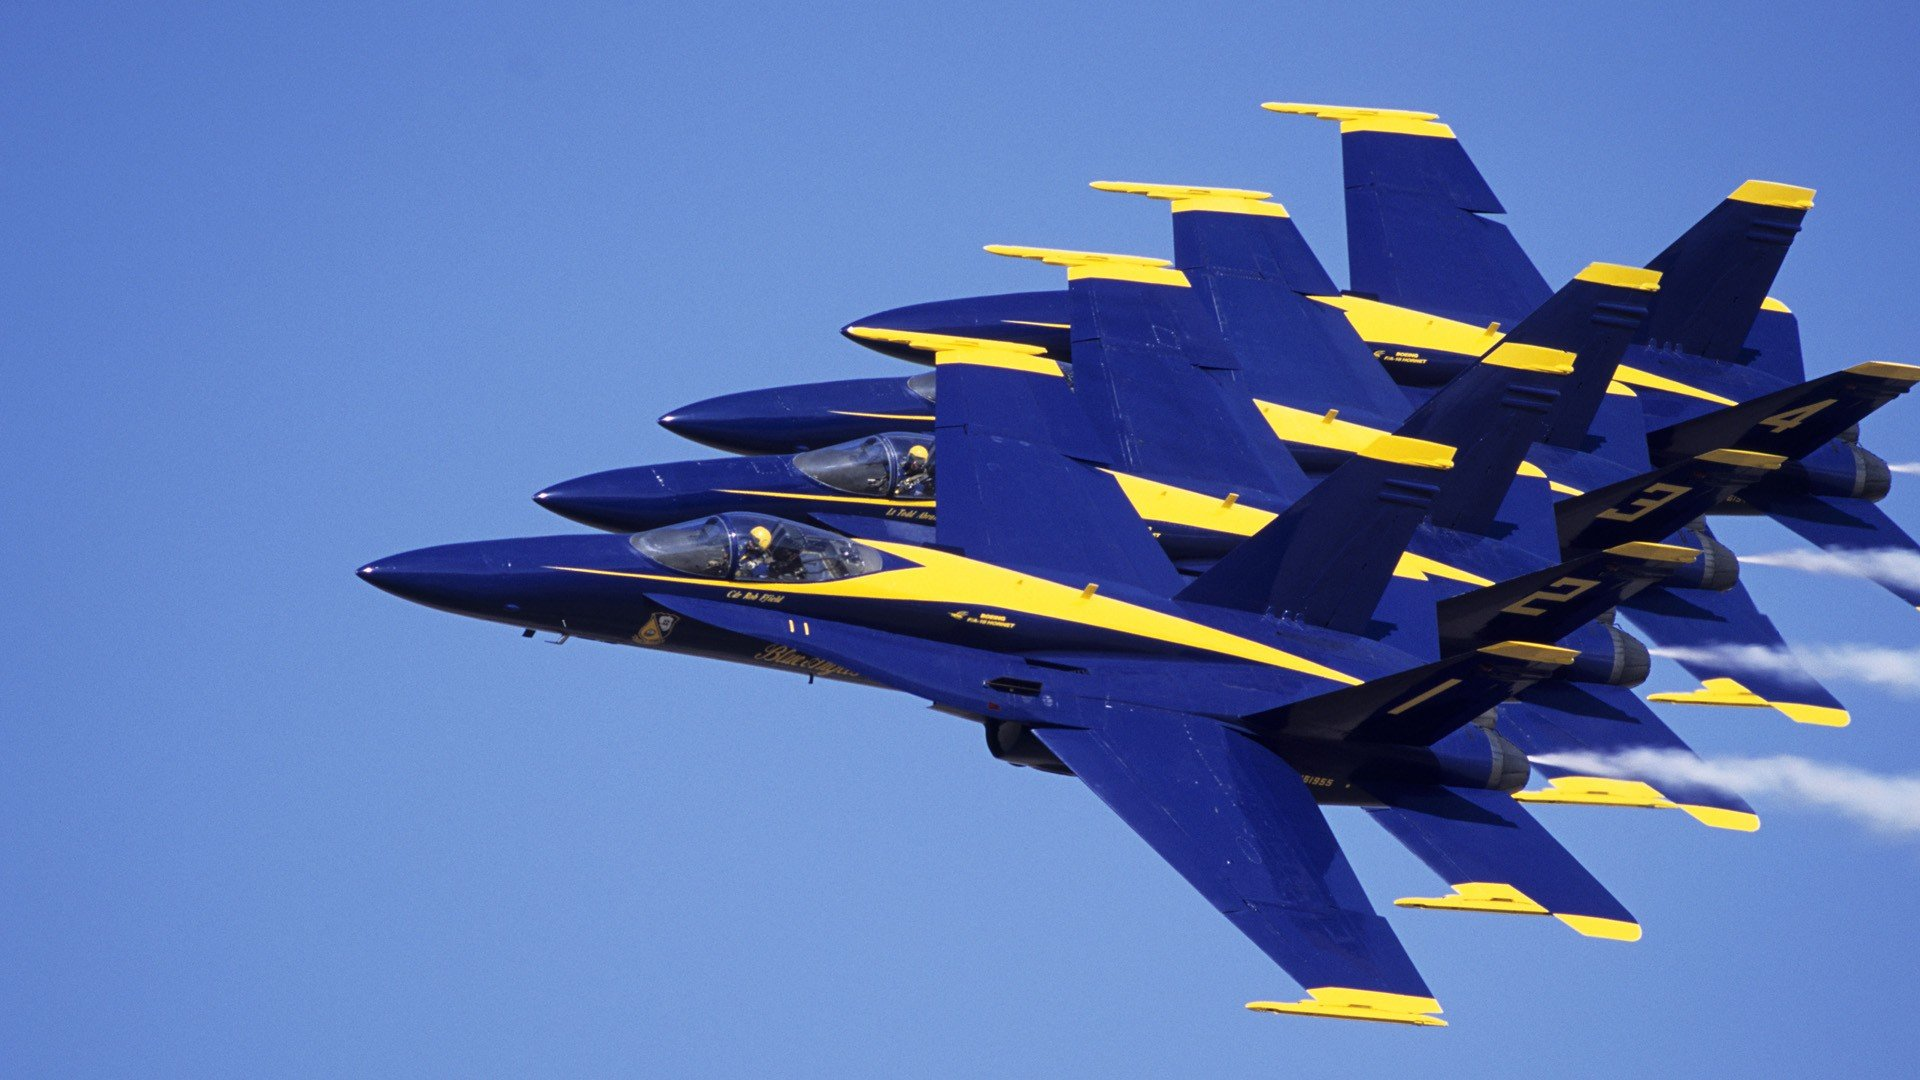 US Navy Blue Angels Wallpaper - WallpaperSafari